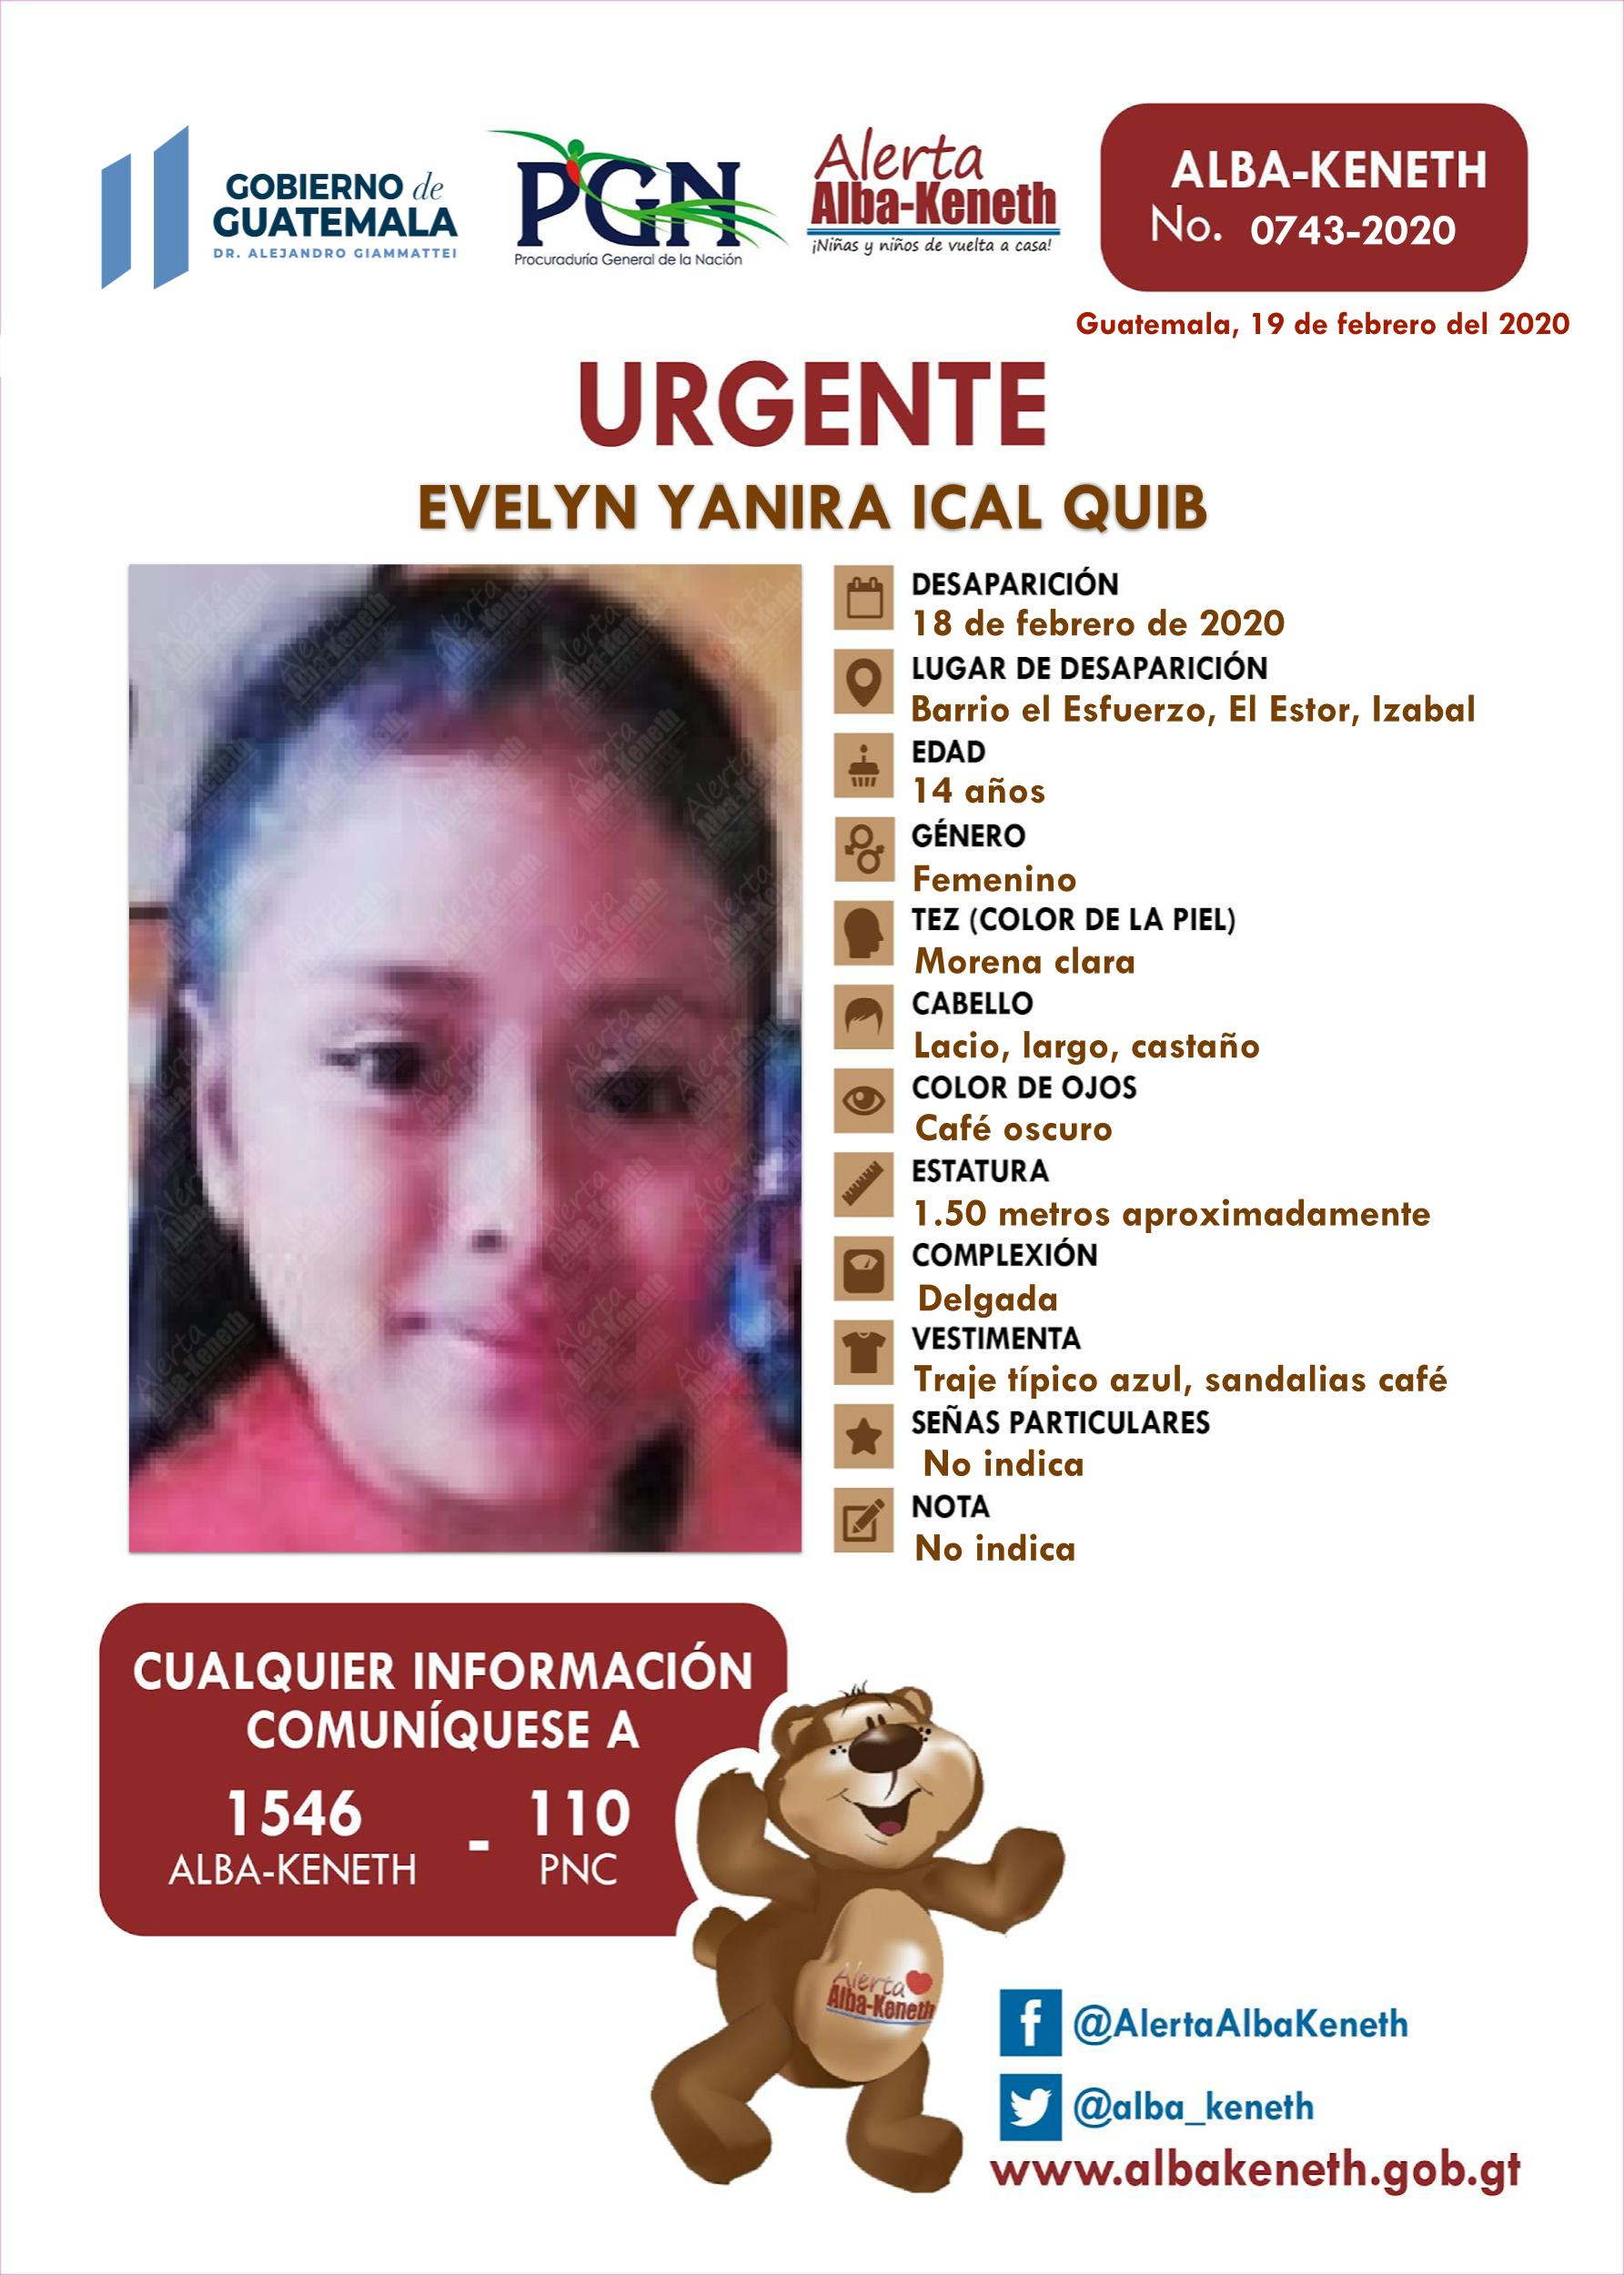 Evelyn Yanira Ical Quib